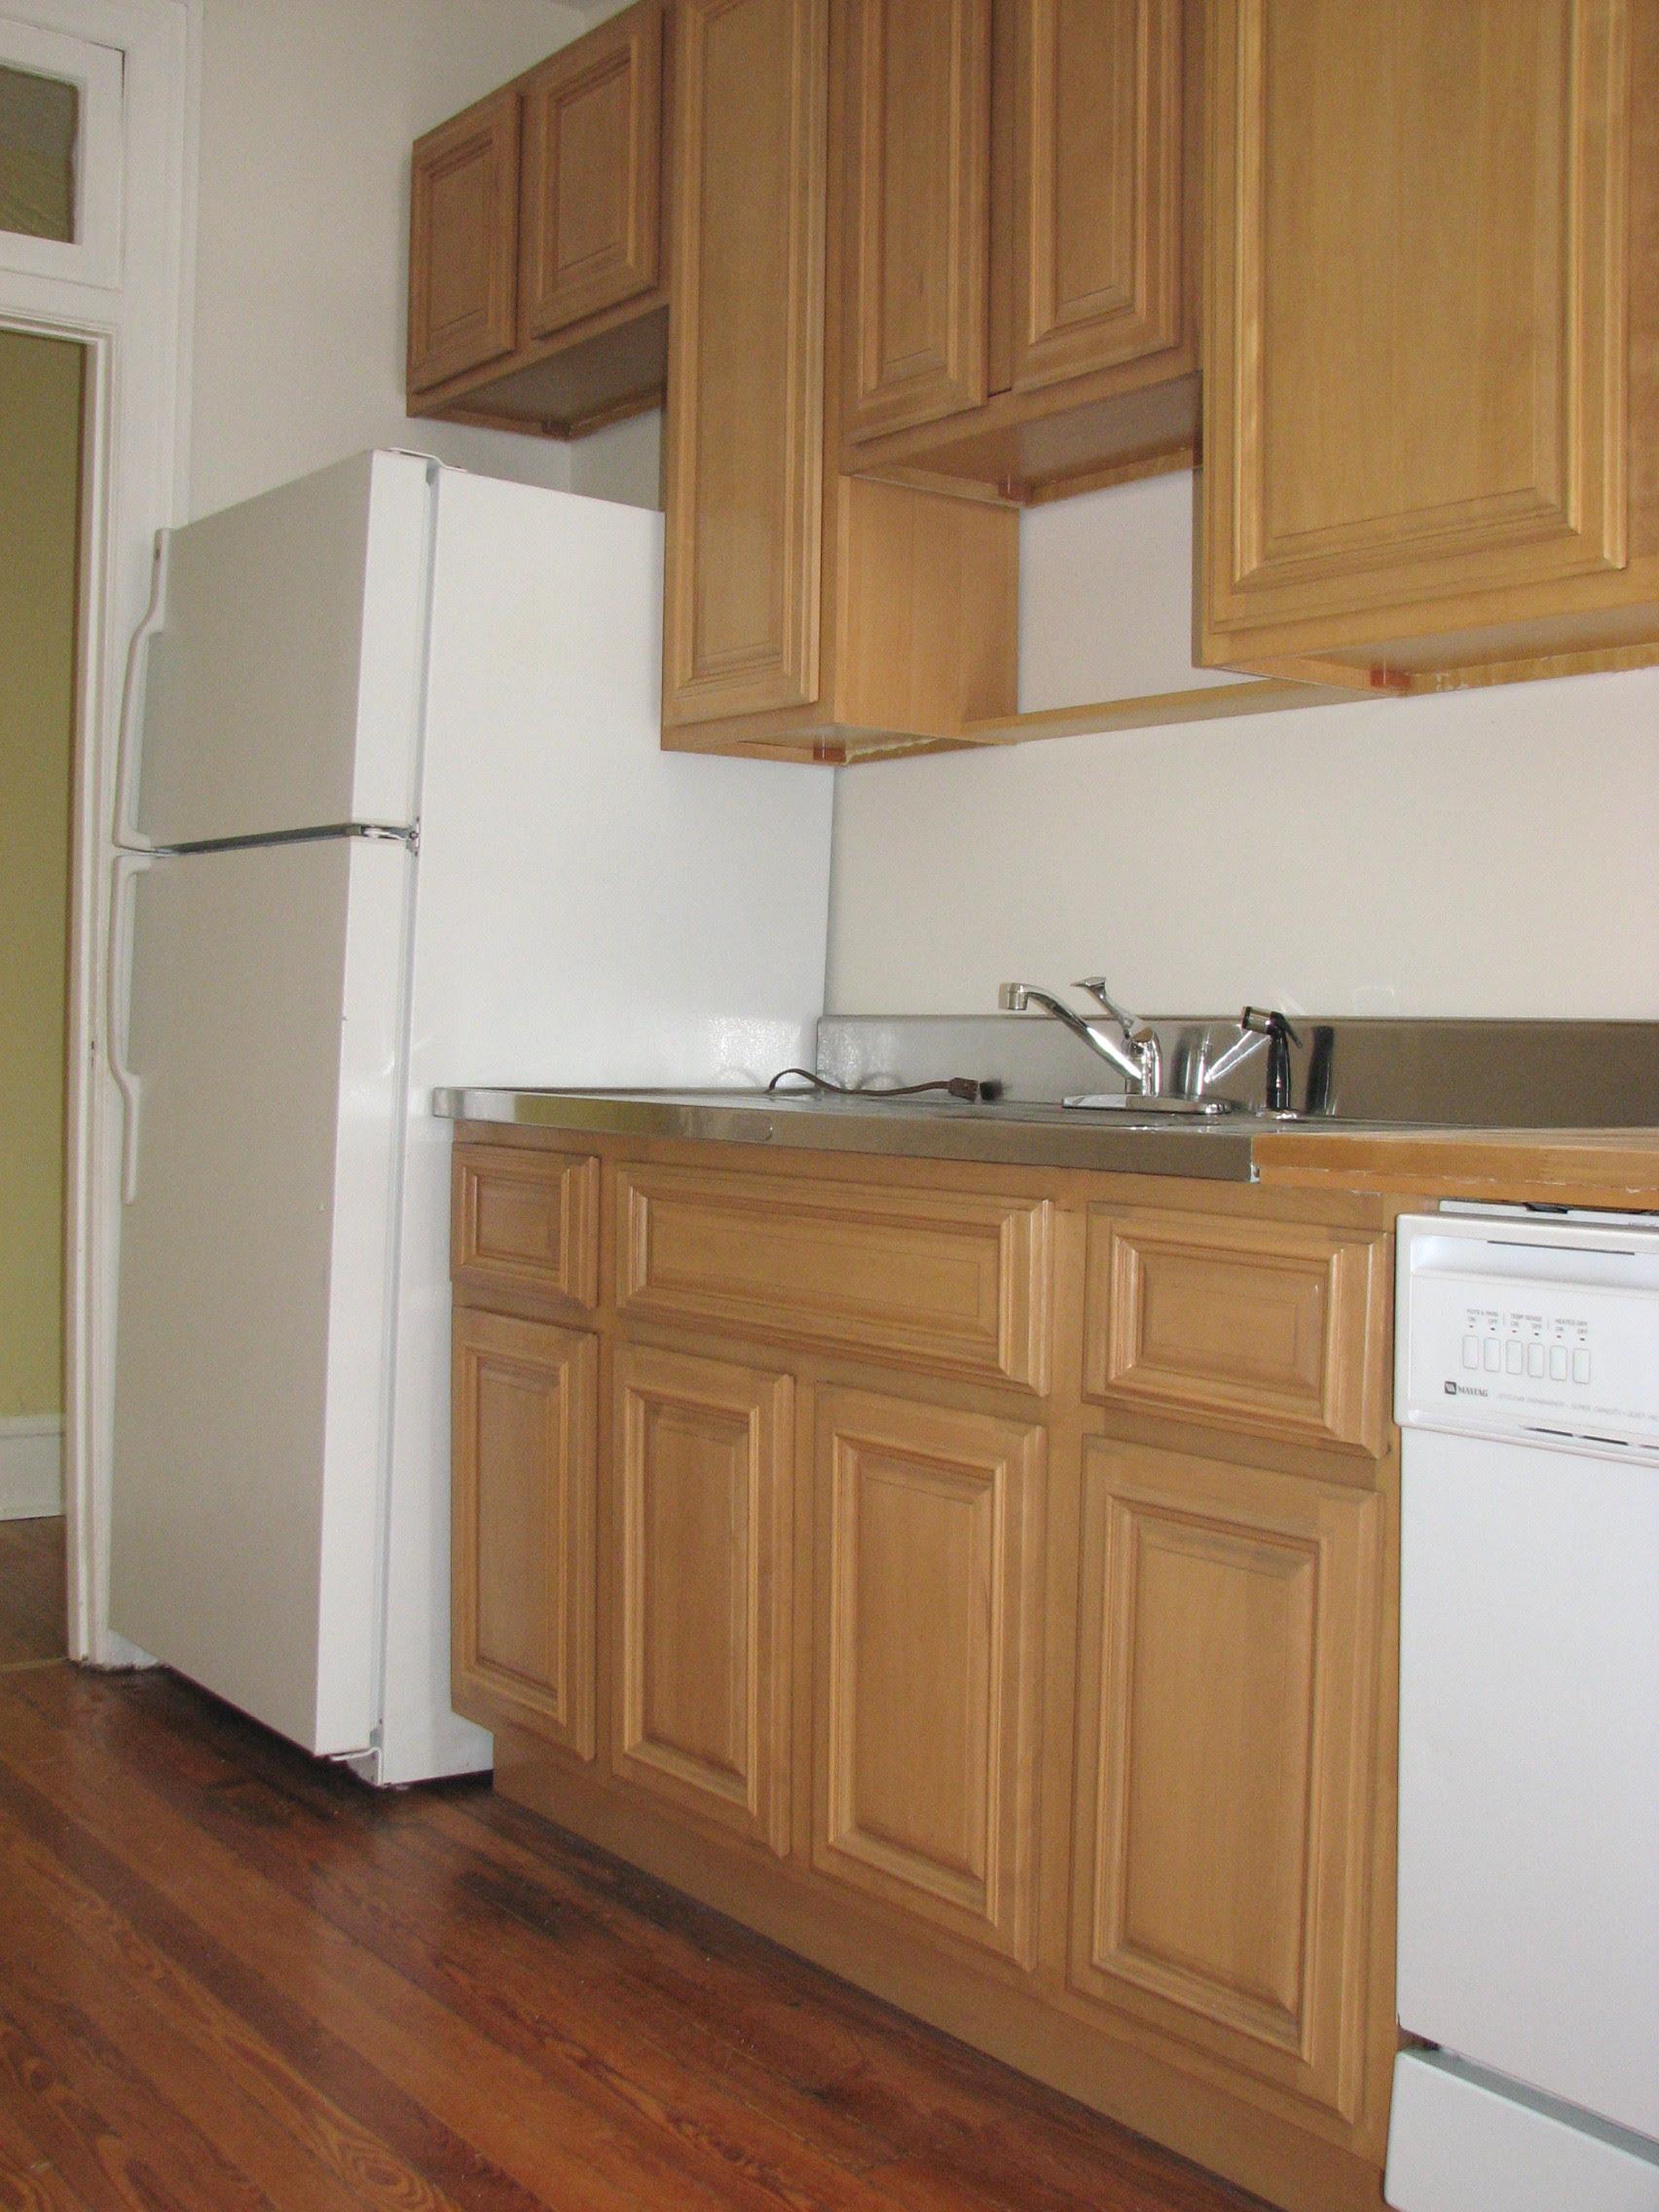 Honey Maple Wood Kitchen Cabinets